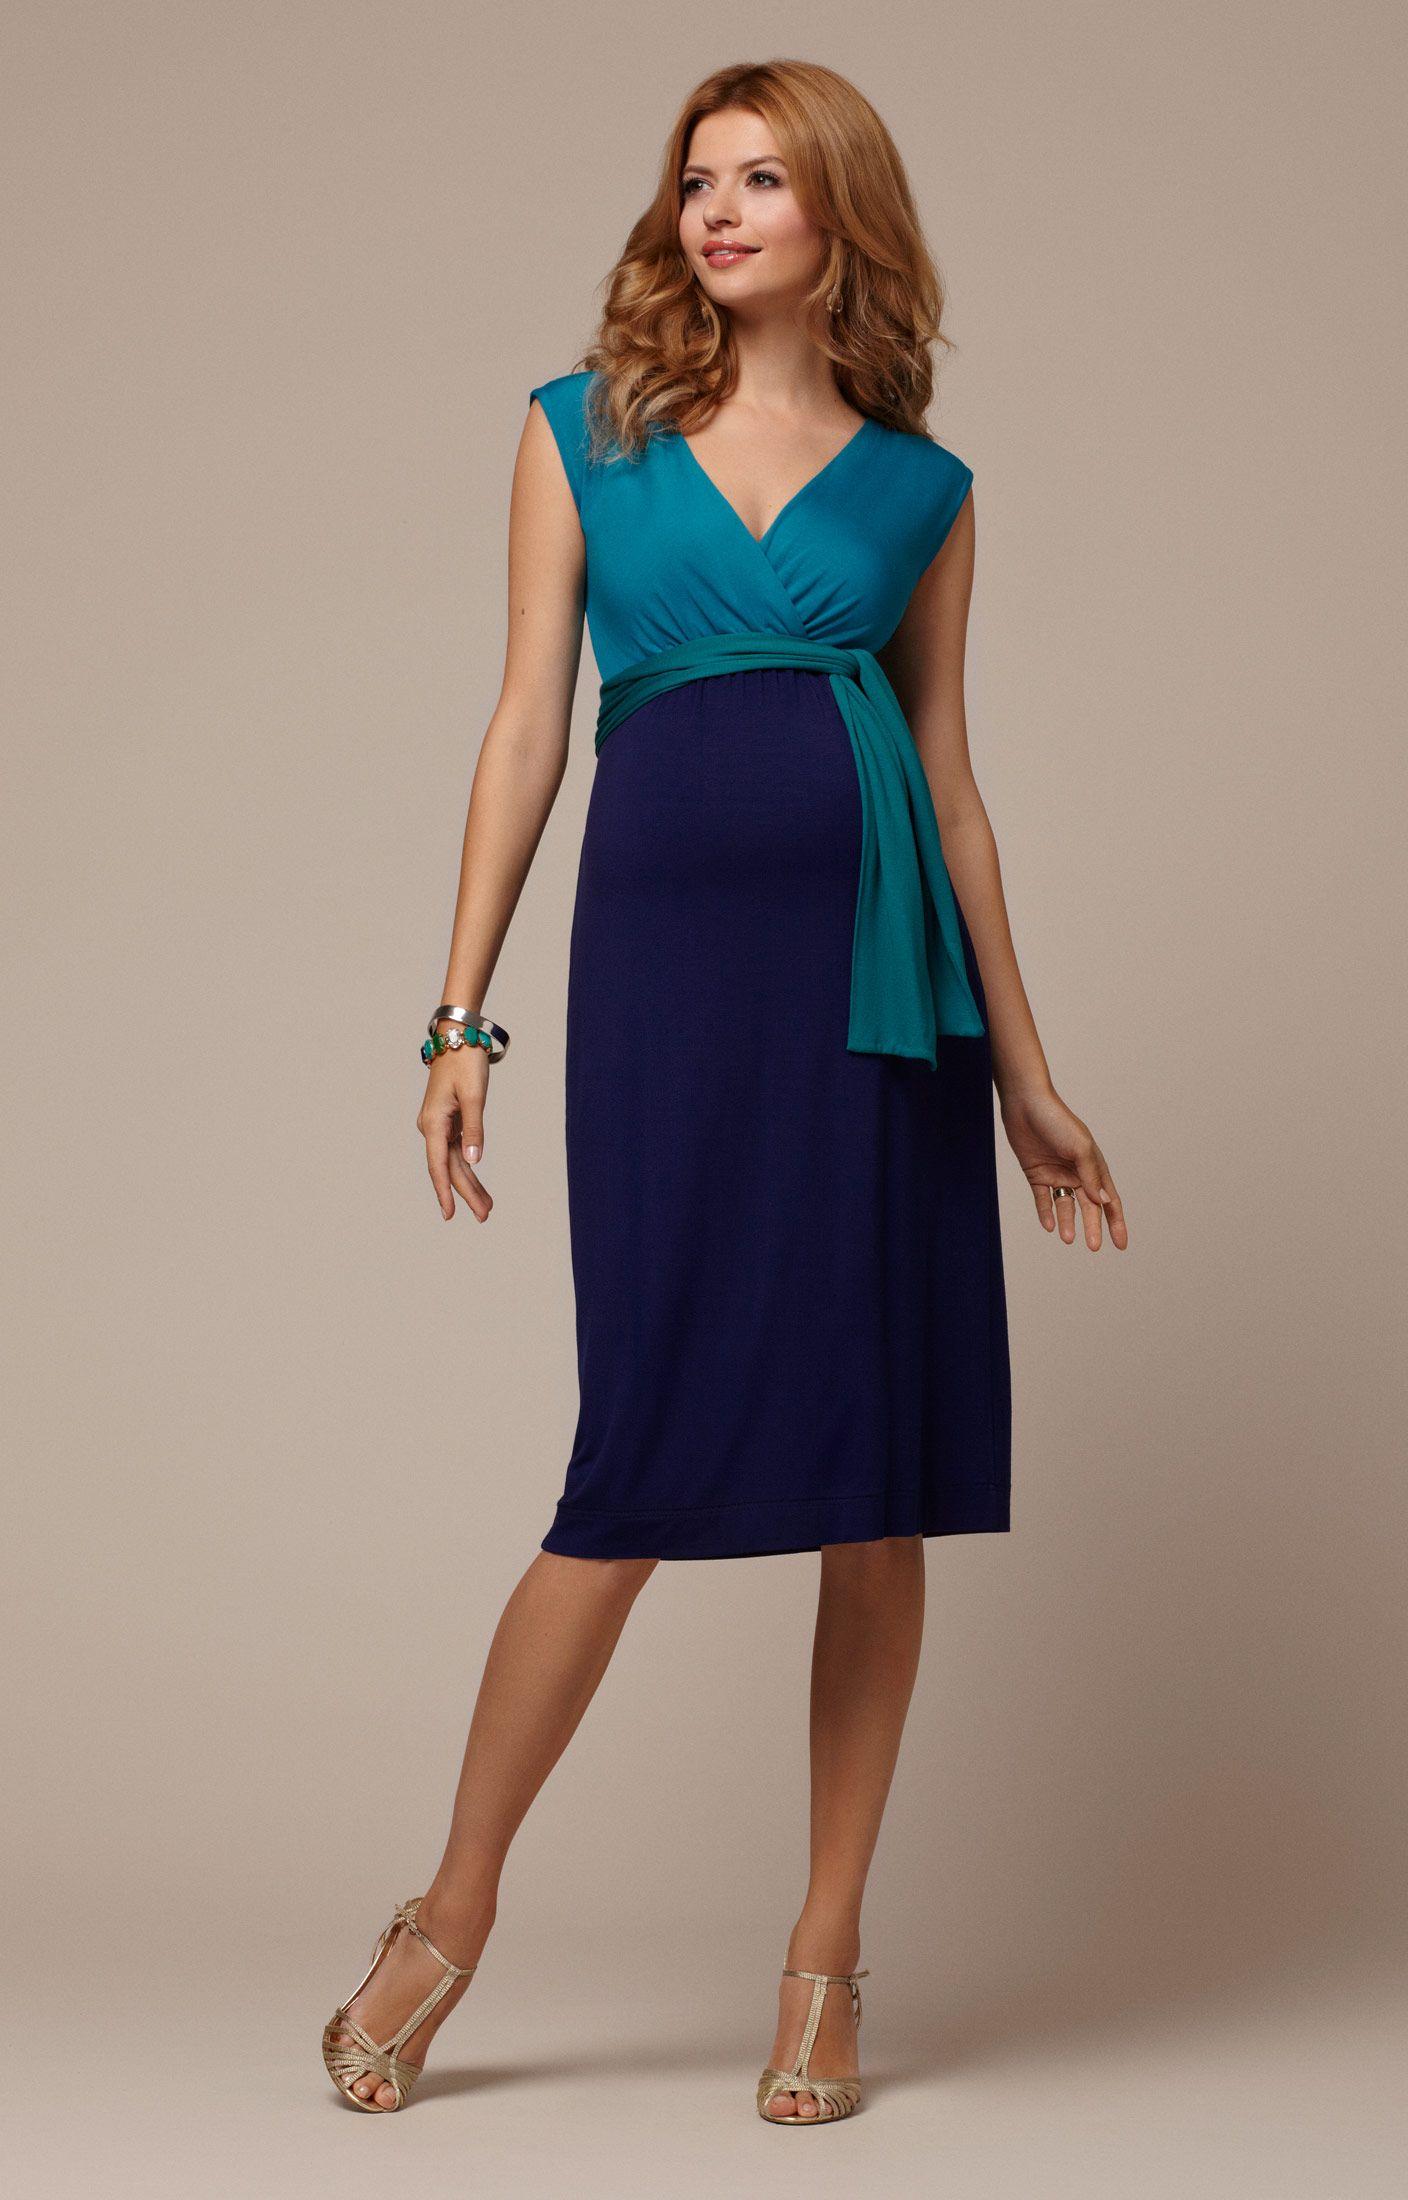 Jewel Block Dress | Tiffany rose, Maternity dresses and Tiffany